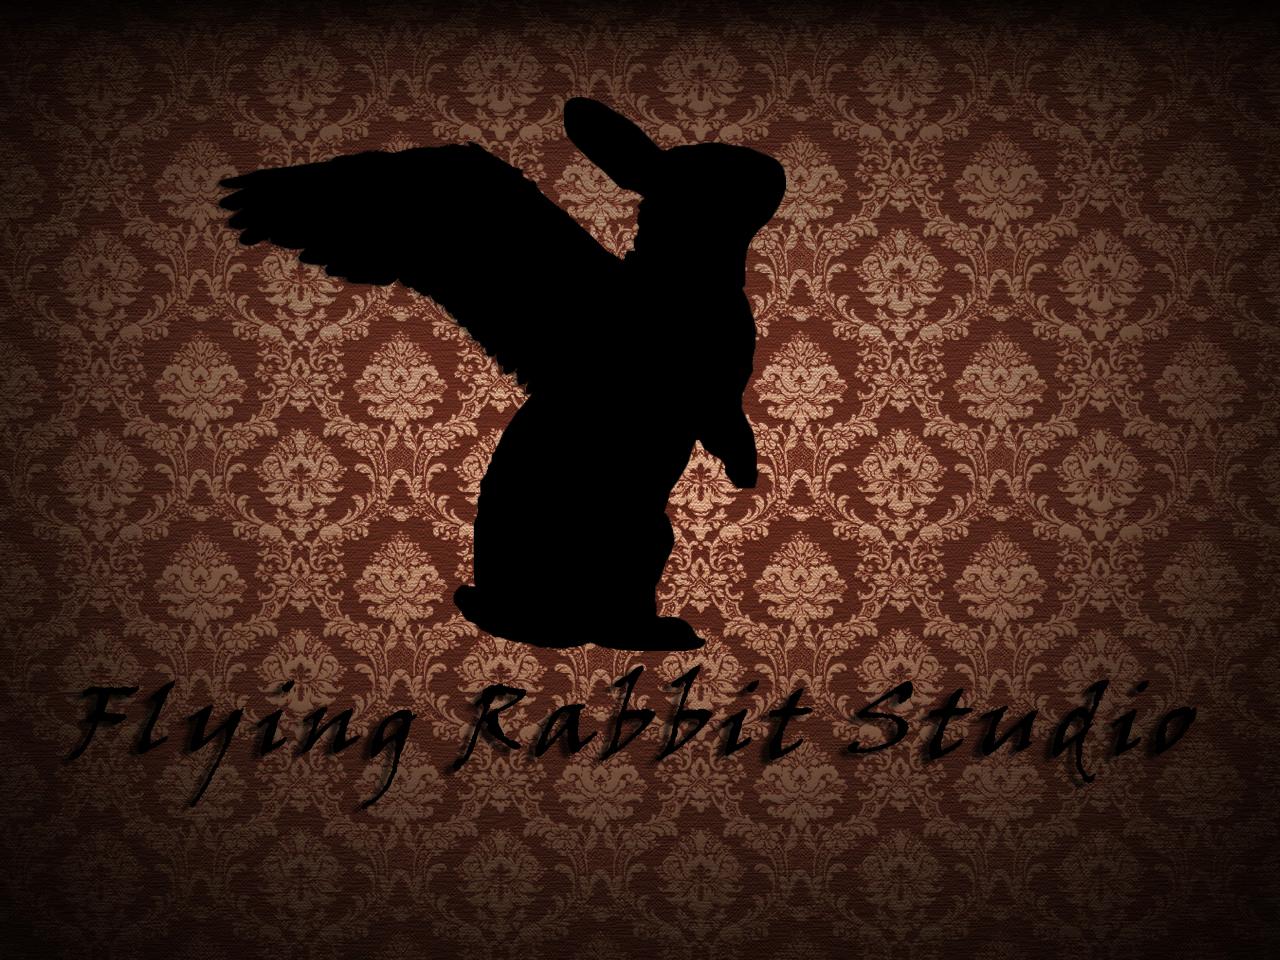 http://3.bp.blogspot.com/-yTo4fXyr_pY/TtUuoFasaII/AAAAAAAAAFM/MgrATz9k74g/s1600/Flying+Rabbit+Studio+wallpaper+2+Damask_Texture_by_mangion.jpg